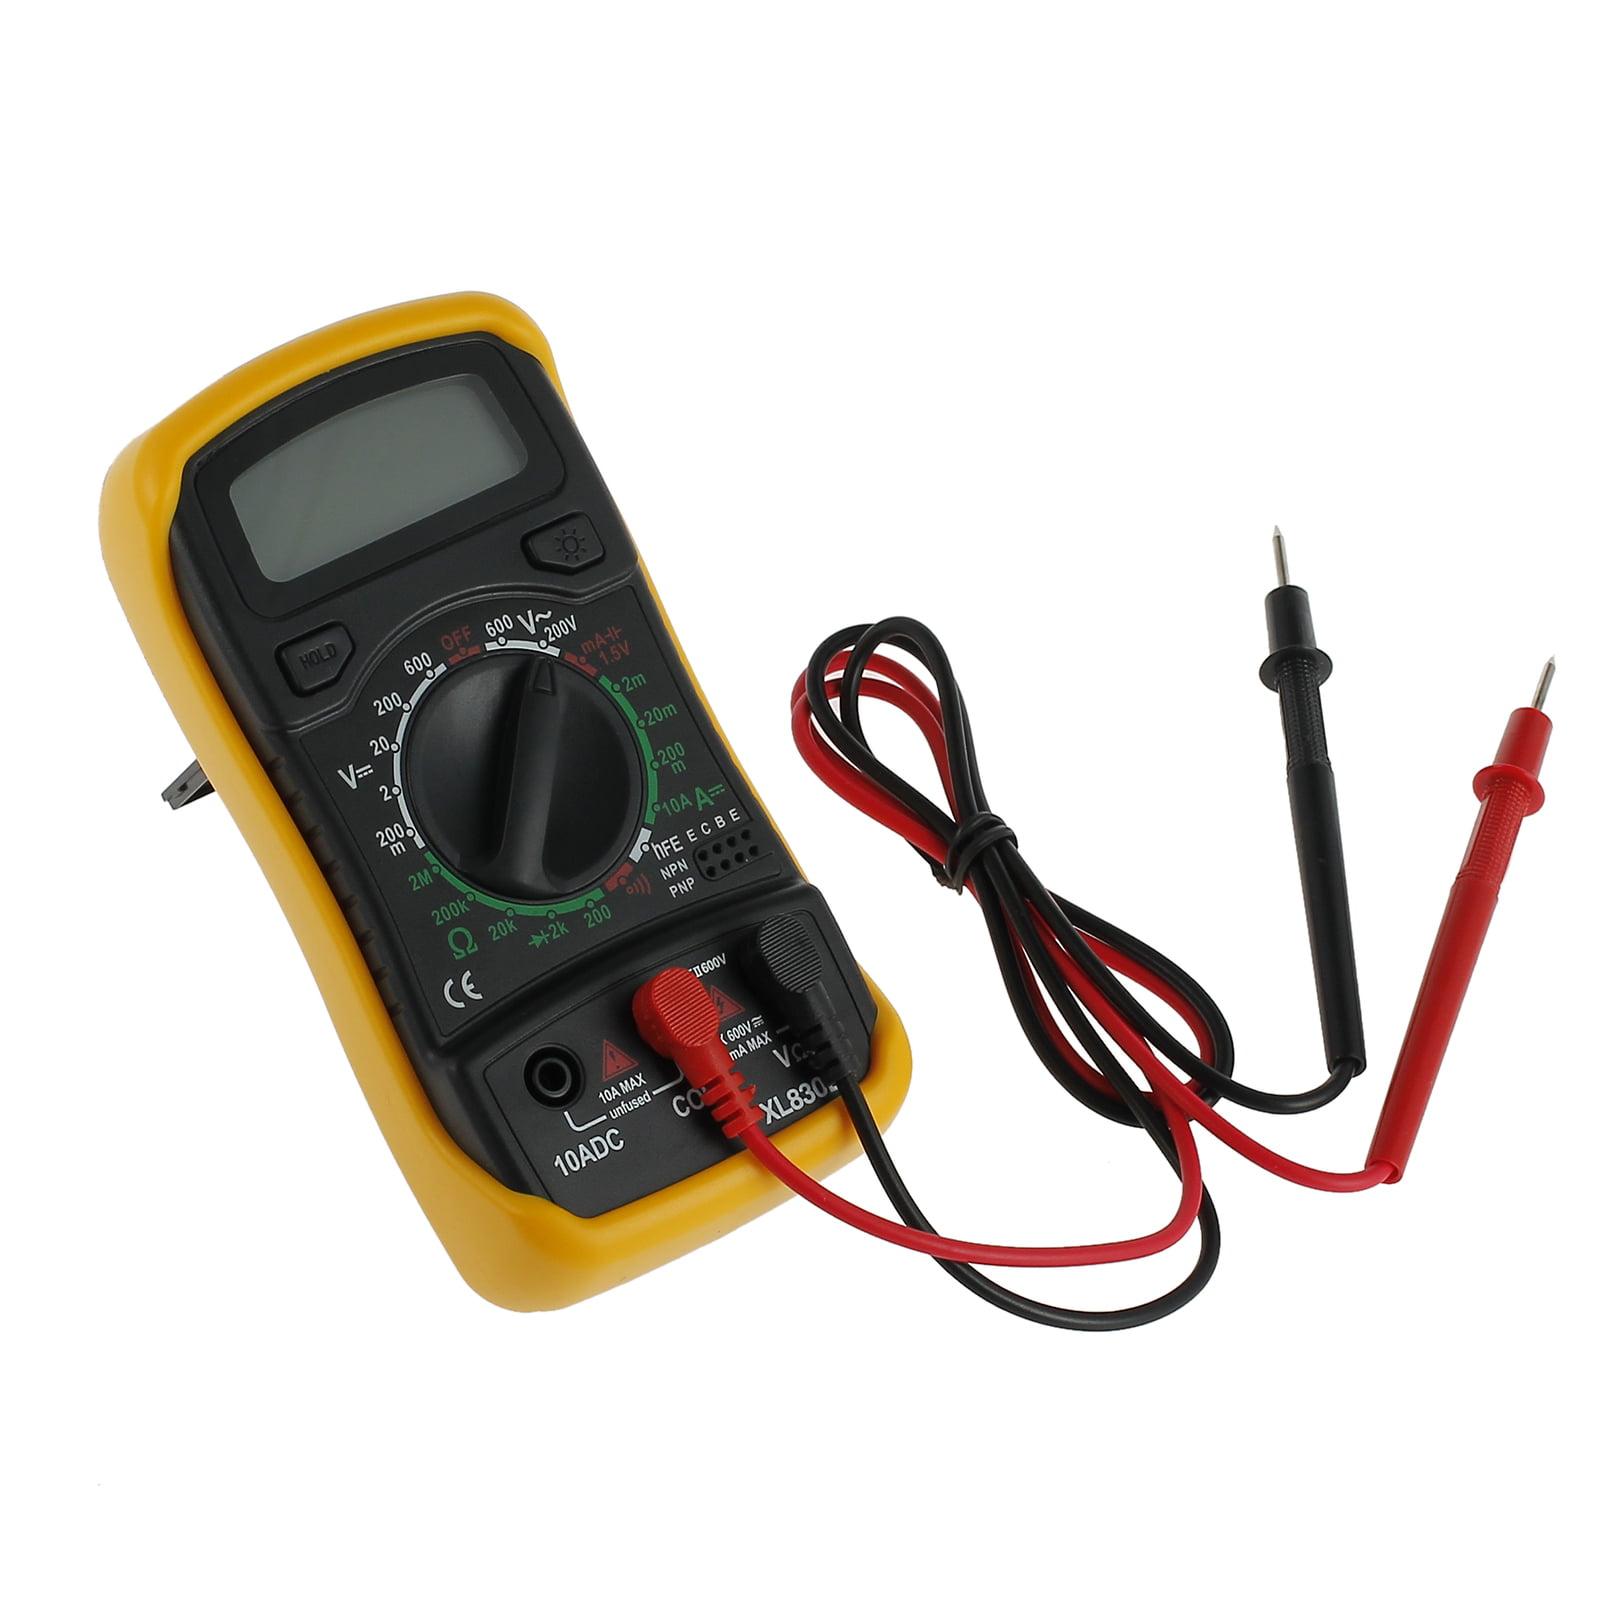 Esynic Digital Lcd Multimeter Xl830l Ac Dc Voltmeter Ammeter Ohm Tester Buzzer Circuit Checker